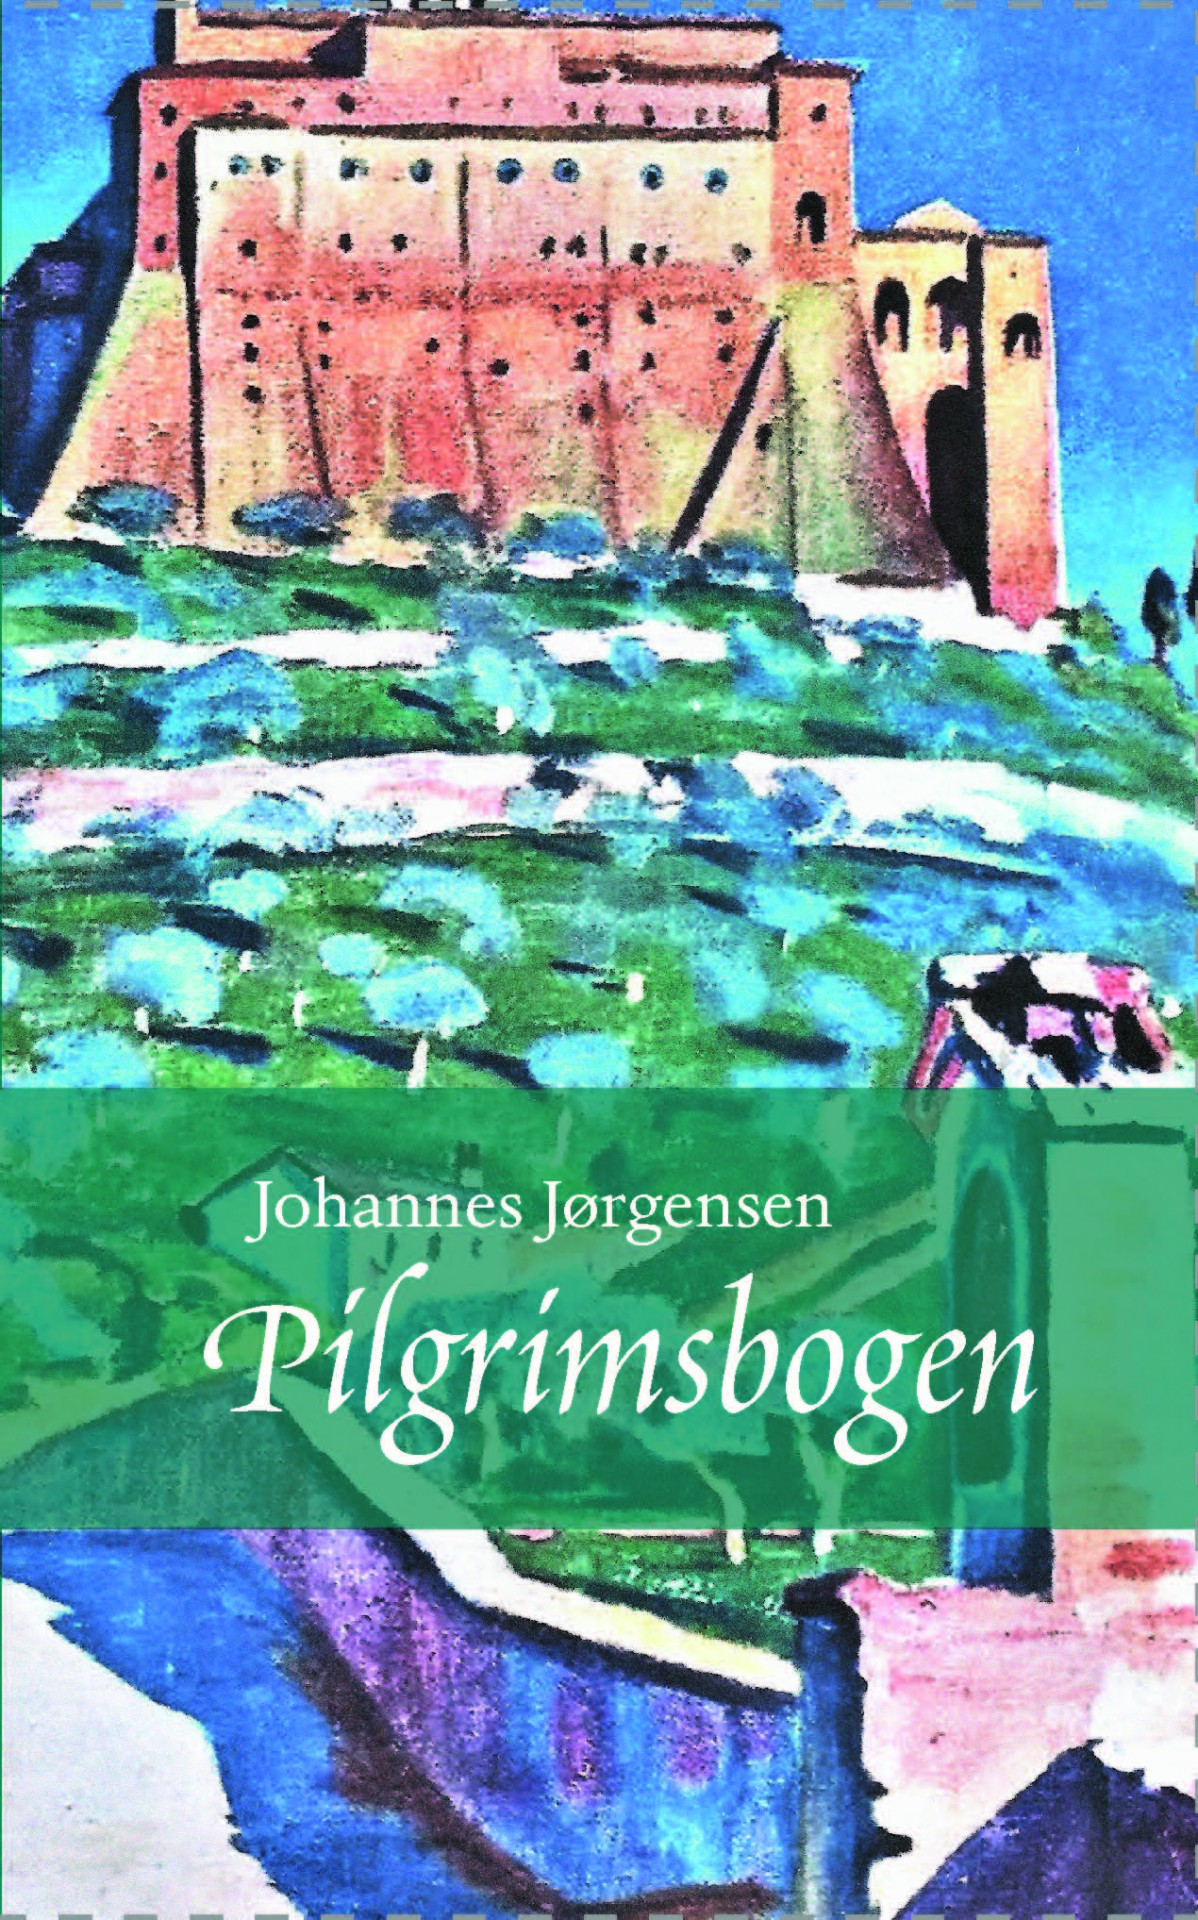 Pilgrimsbogen